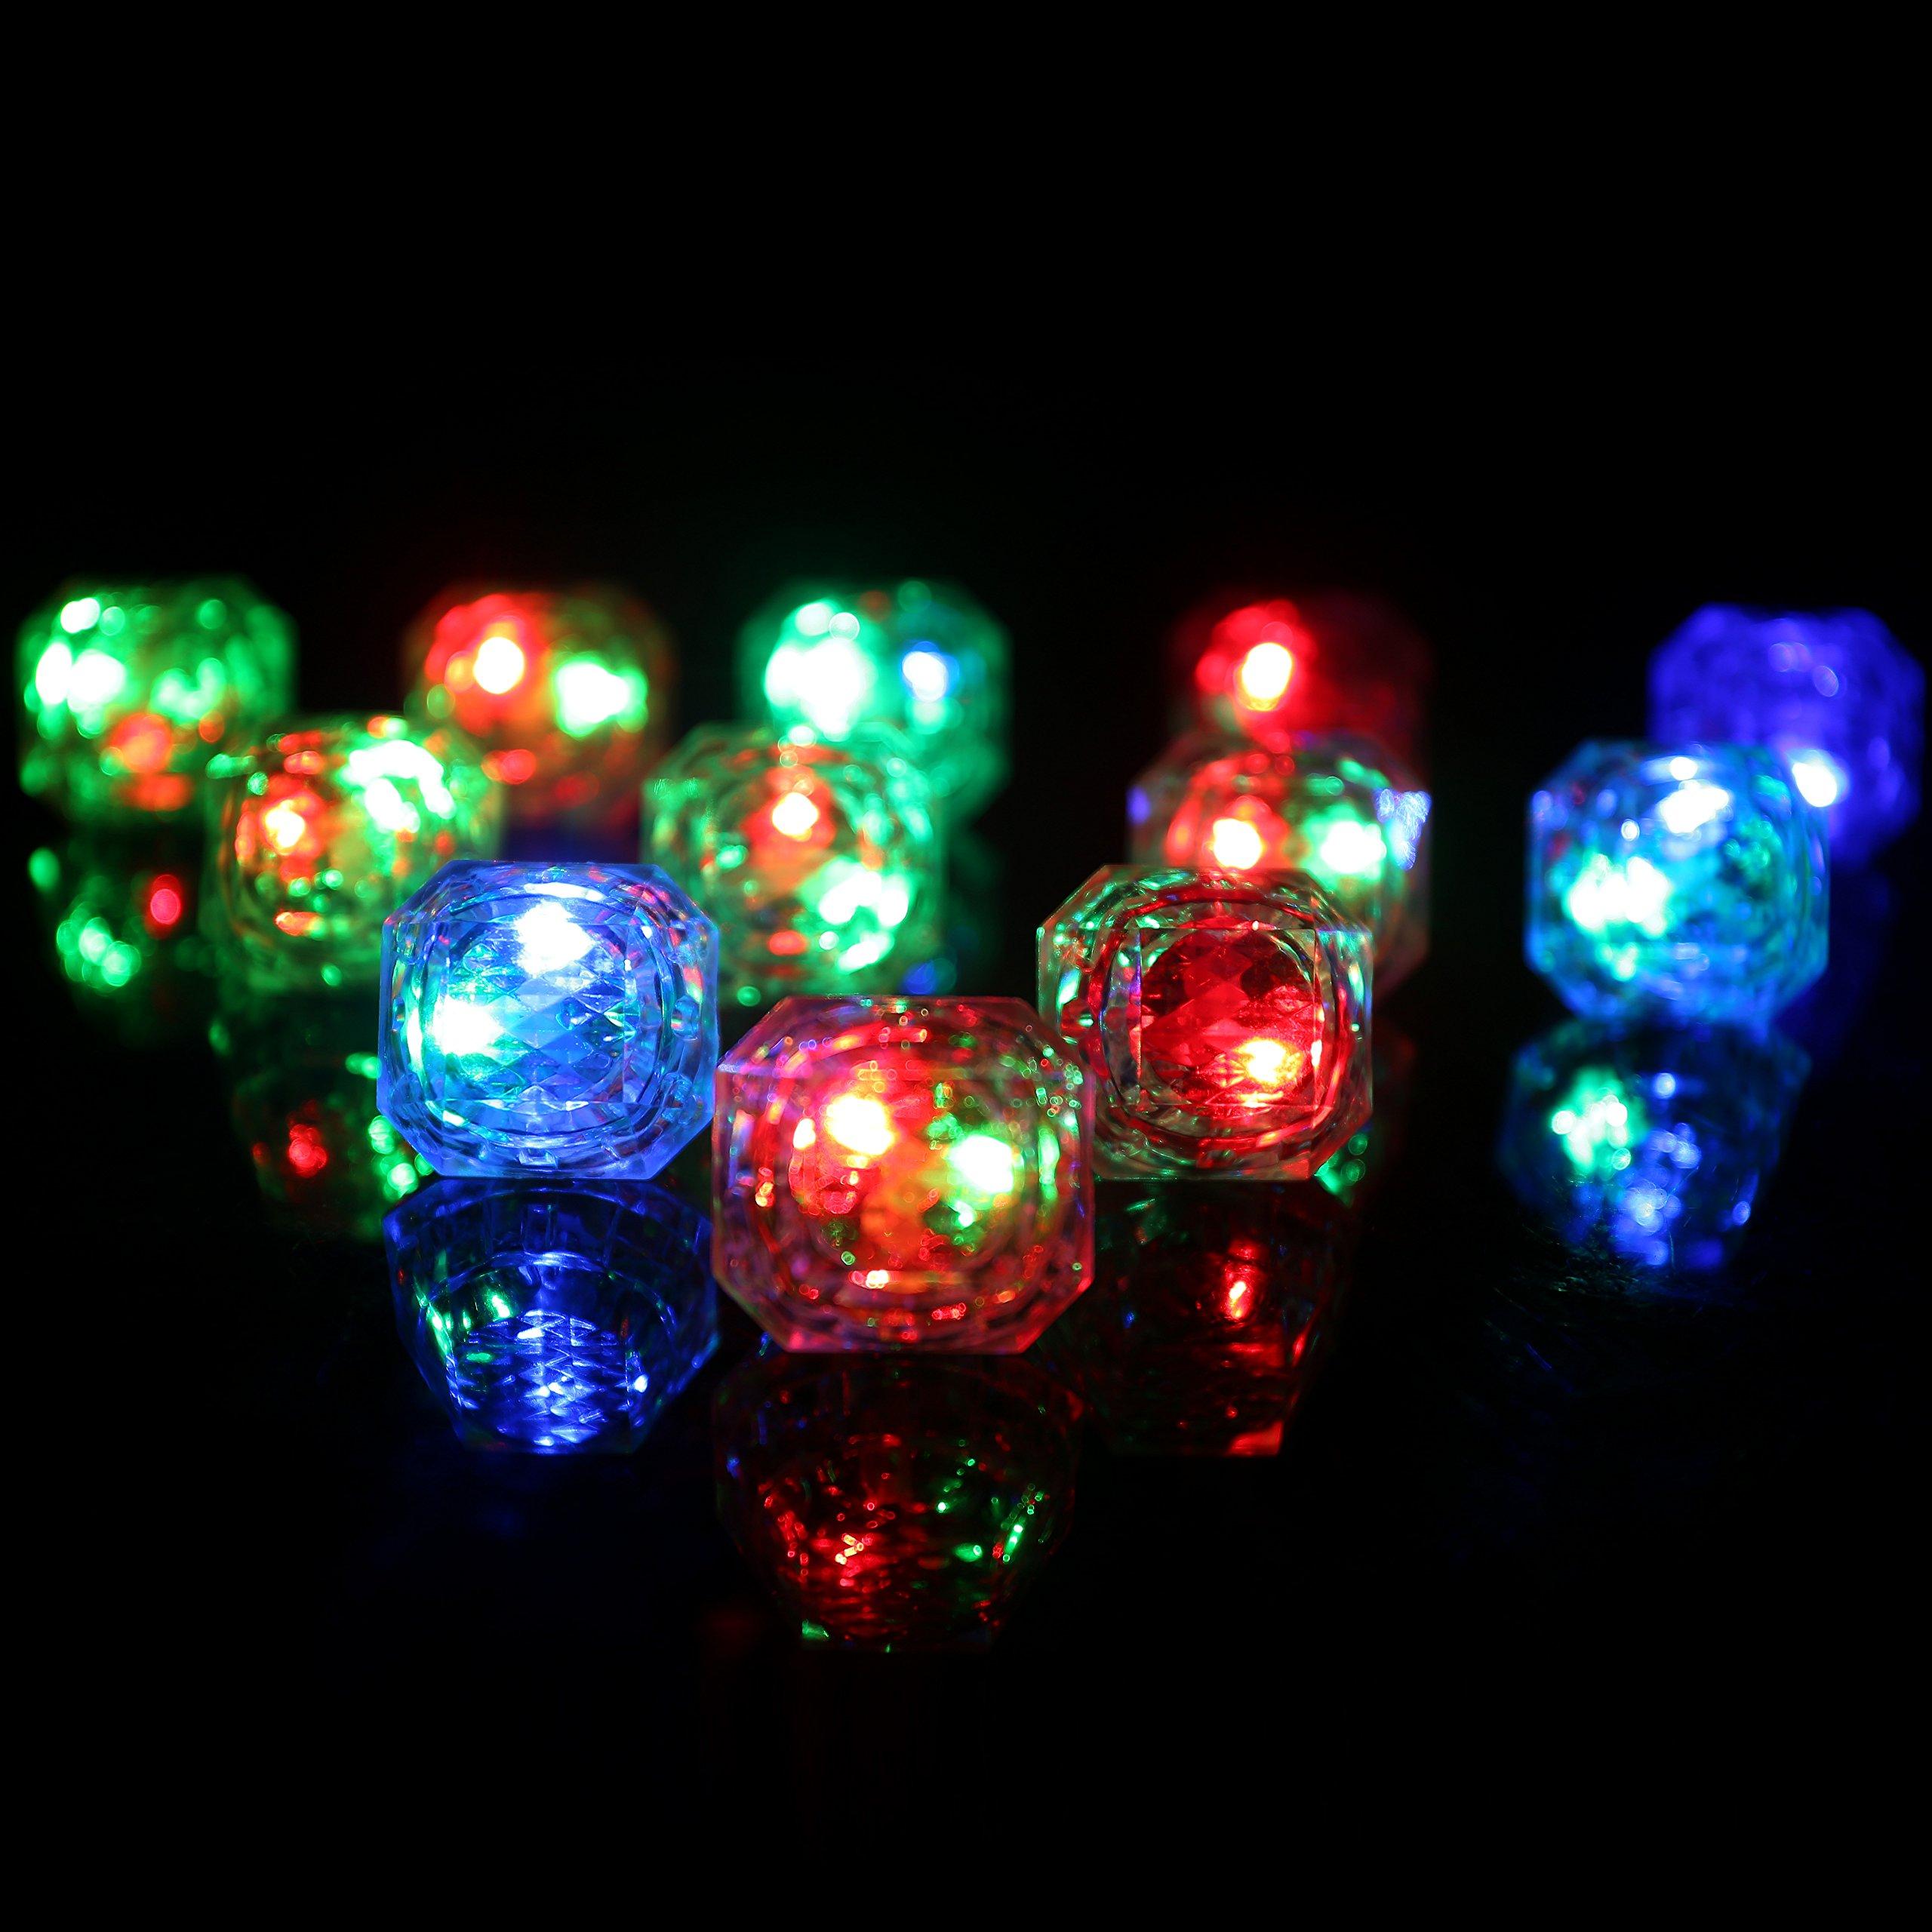 Konsait Flashing Led Light up Ring Toys Diamond Grow in the Dark Jelly Bumpy Rings for Birthday Bachelorette Bridal Shower Gatsby Party Favors (12pcs) by Konsait (Image #7)